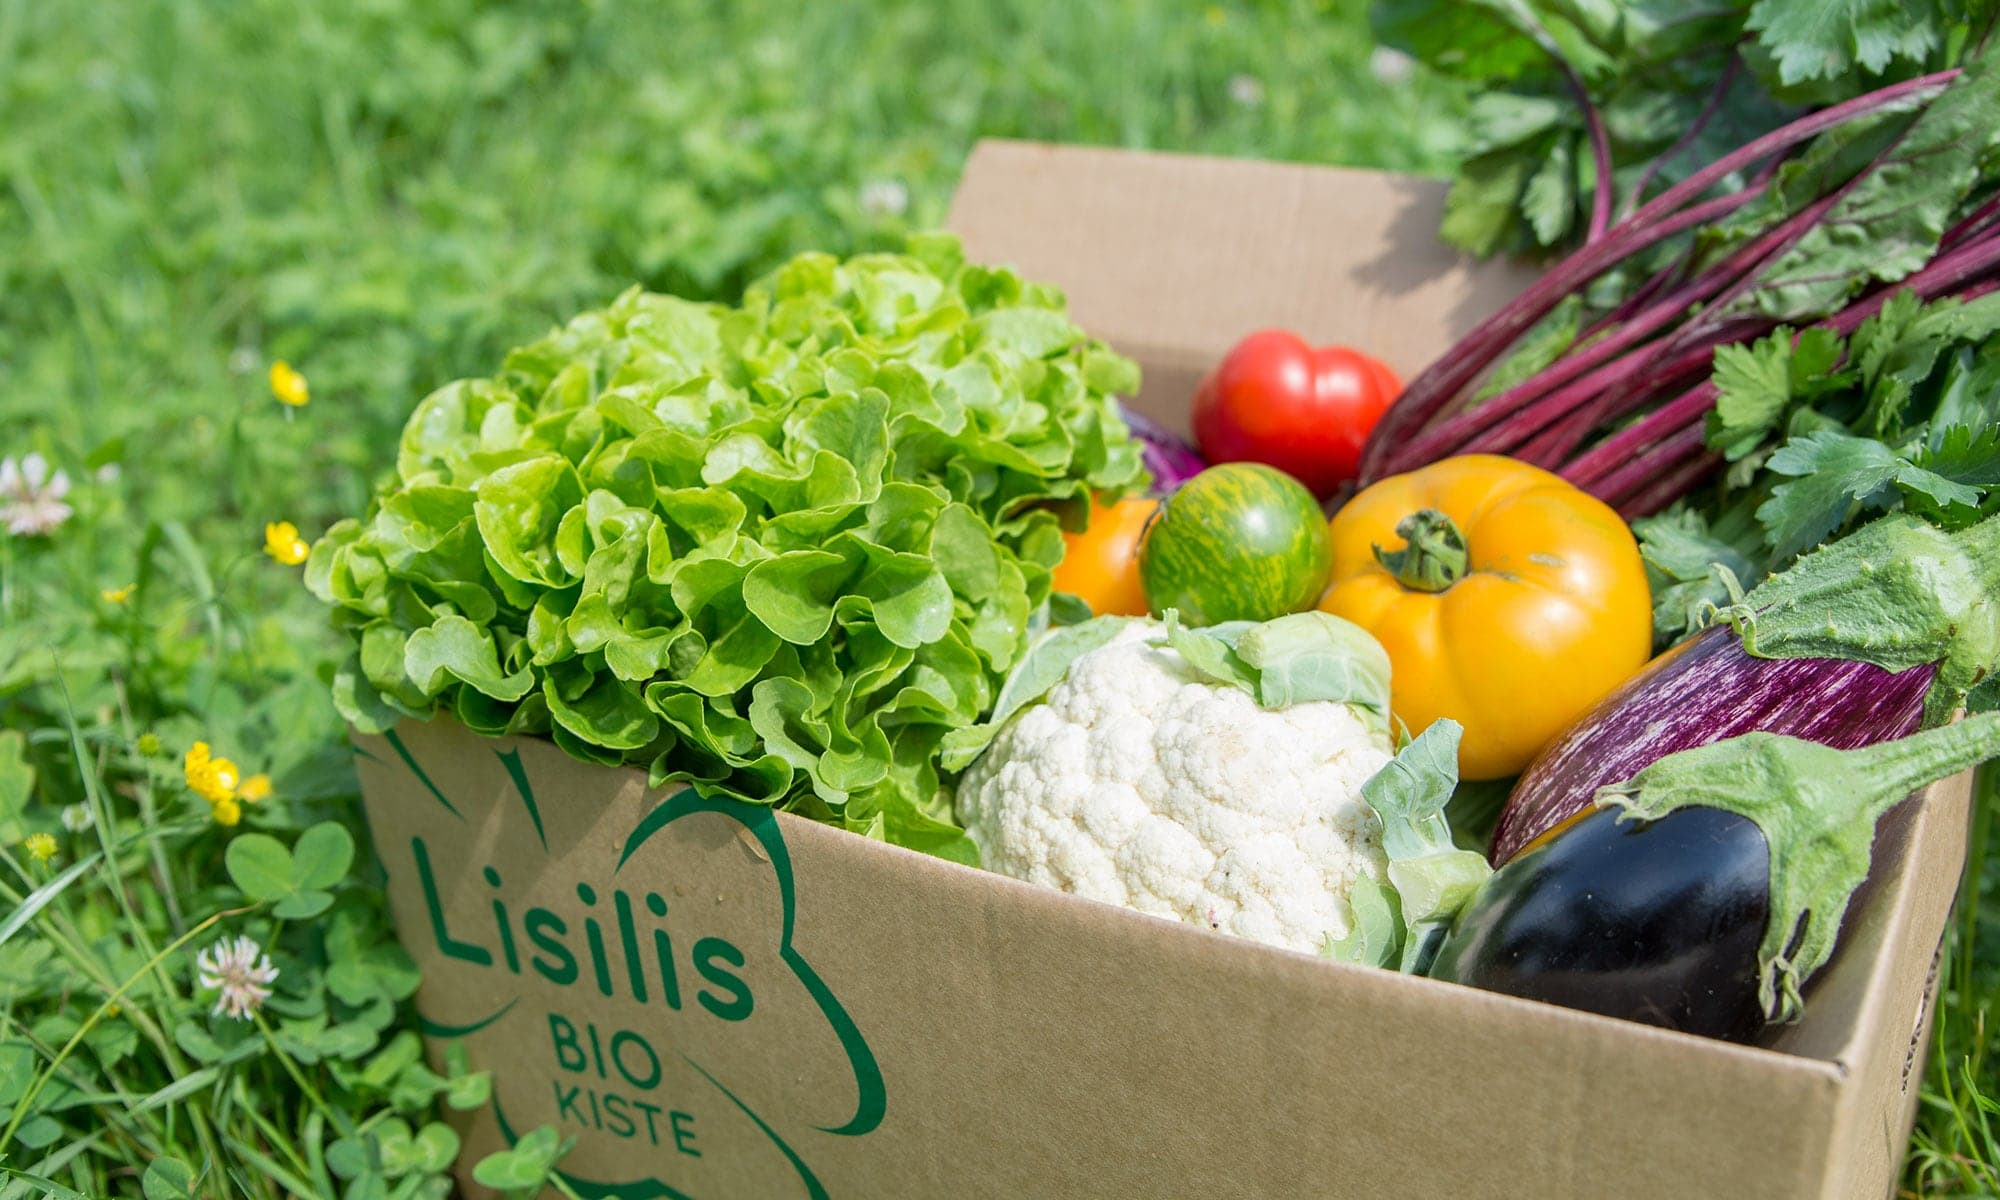 Lisilis Bio-Kiste bewerten